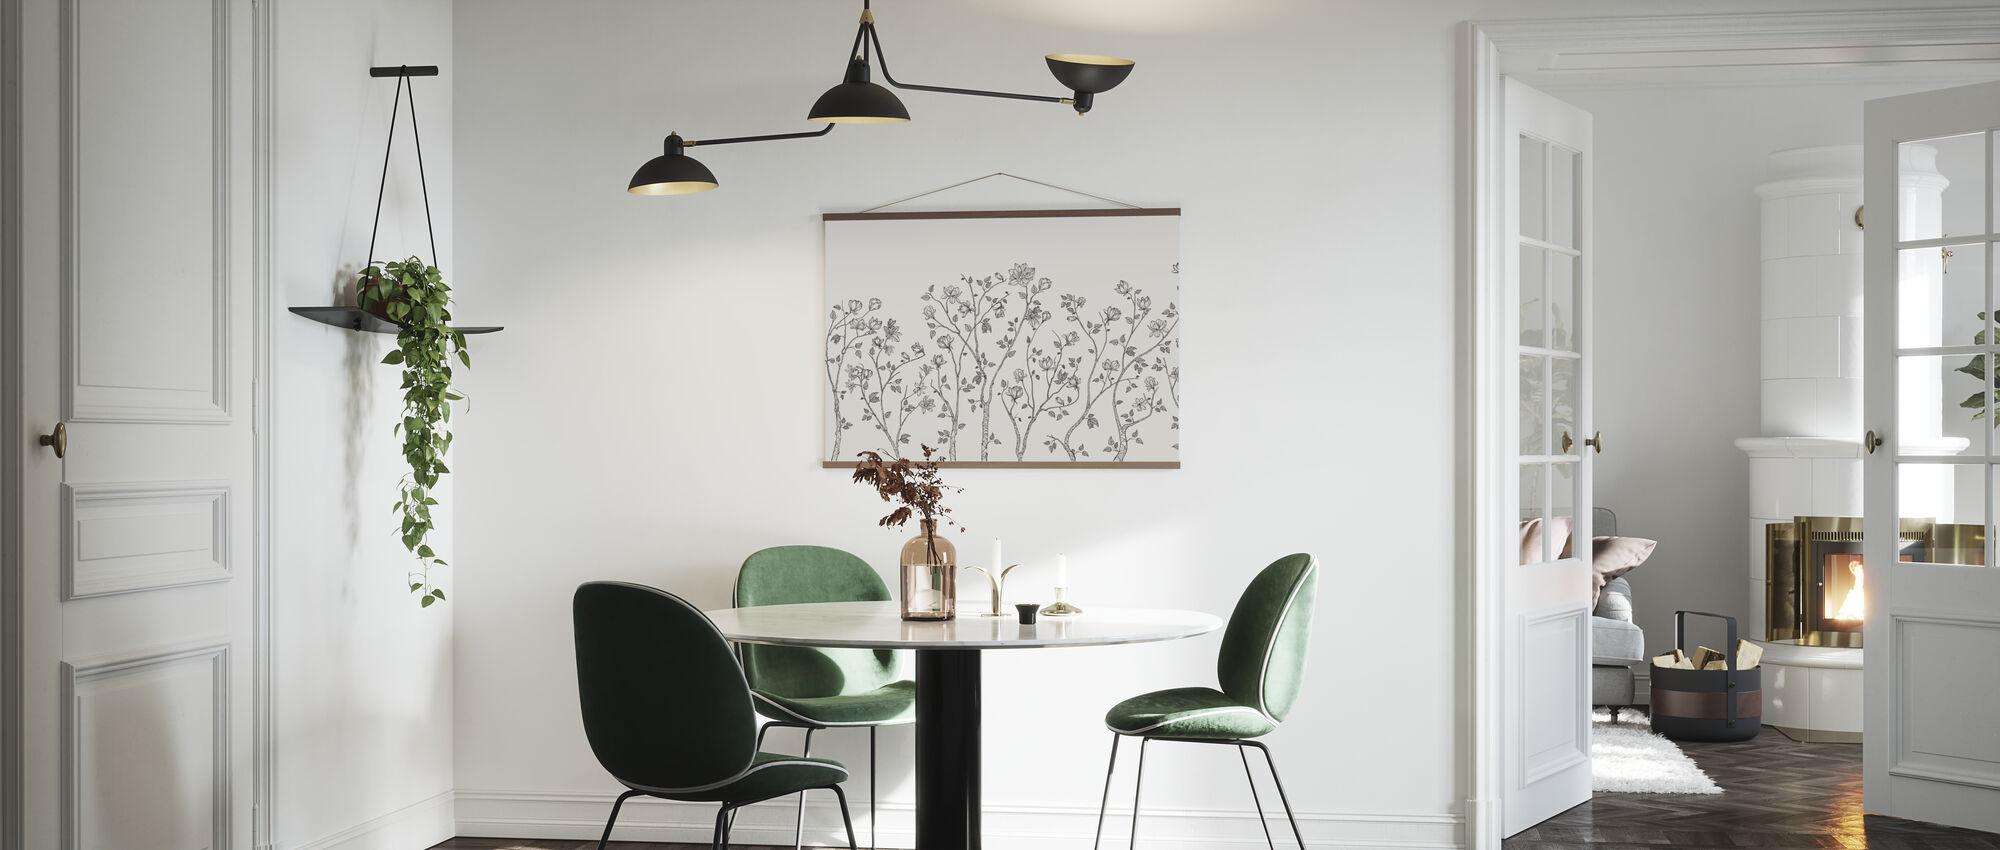 Mezzaluna Vegetativa - Luminosa - Poster - Cucina